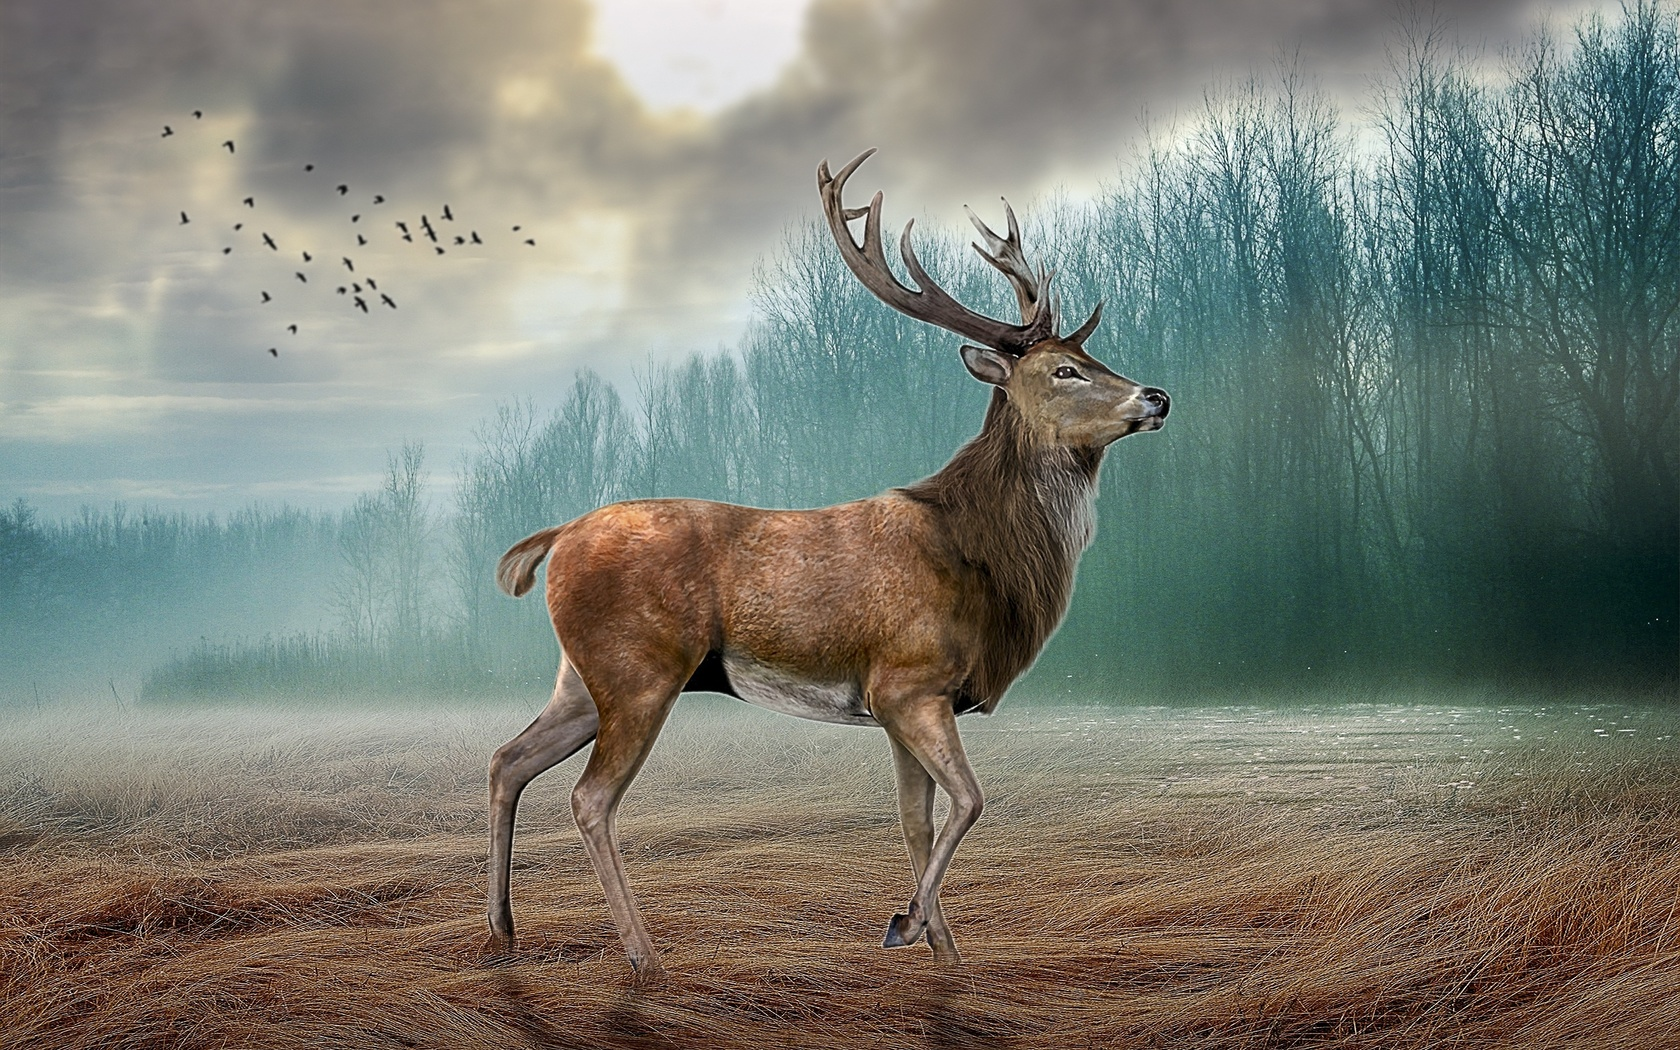 Картинка олень уходи